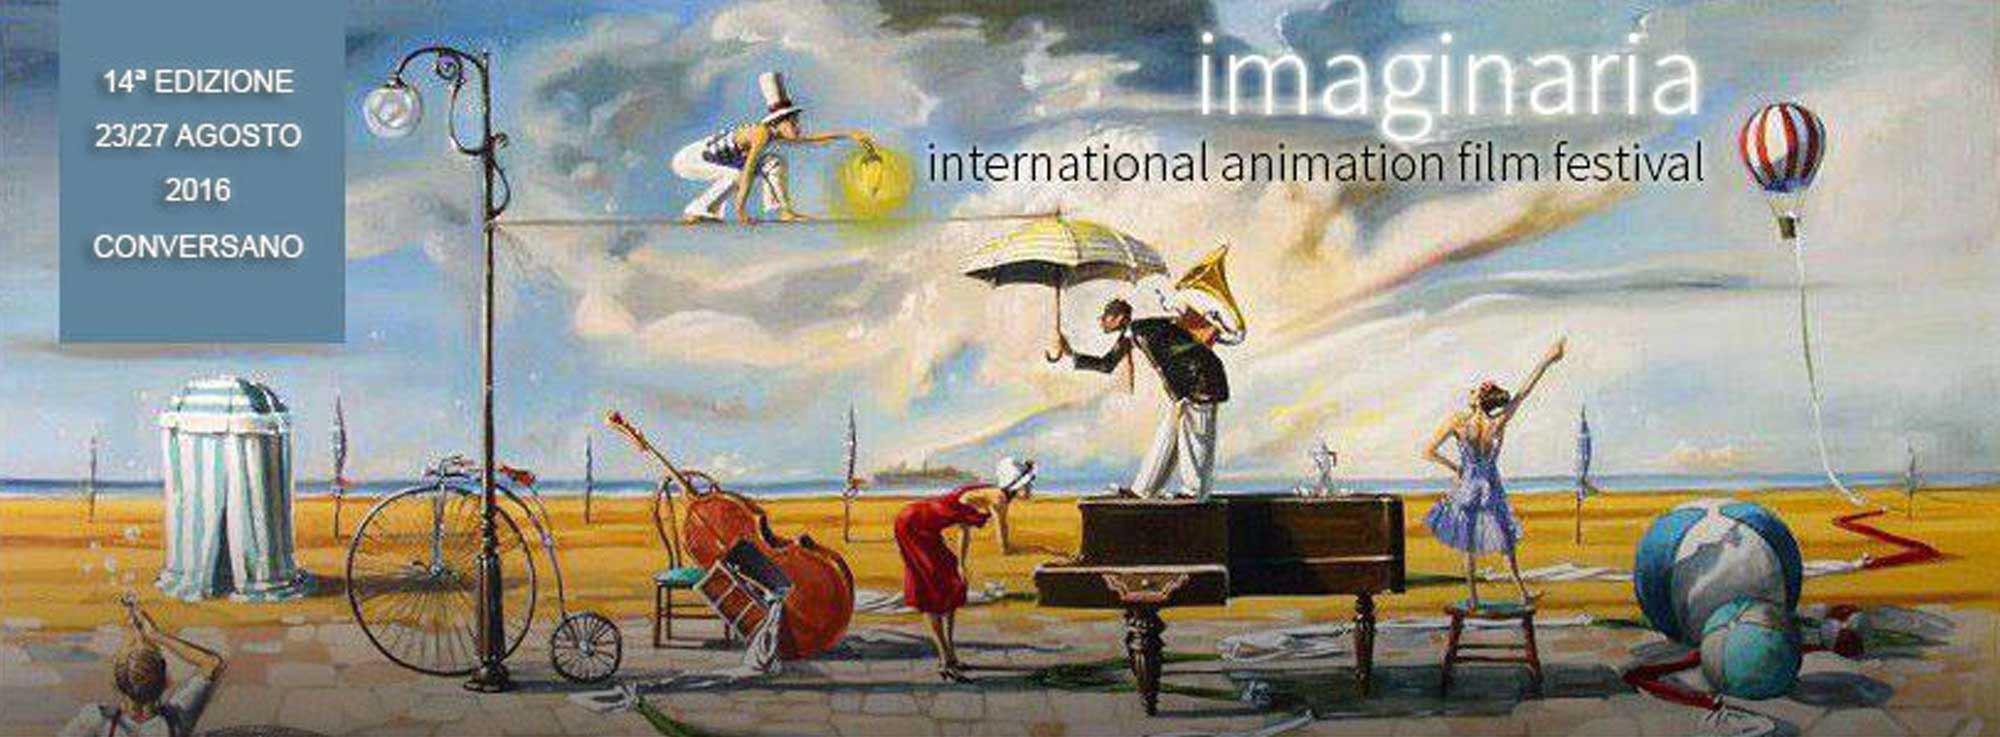 Conversano: Imaginaria - International animation film festival